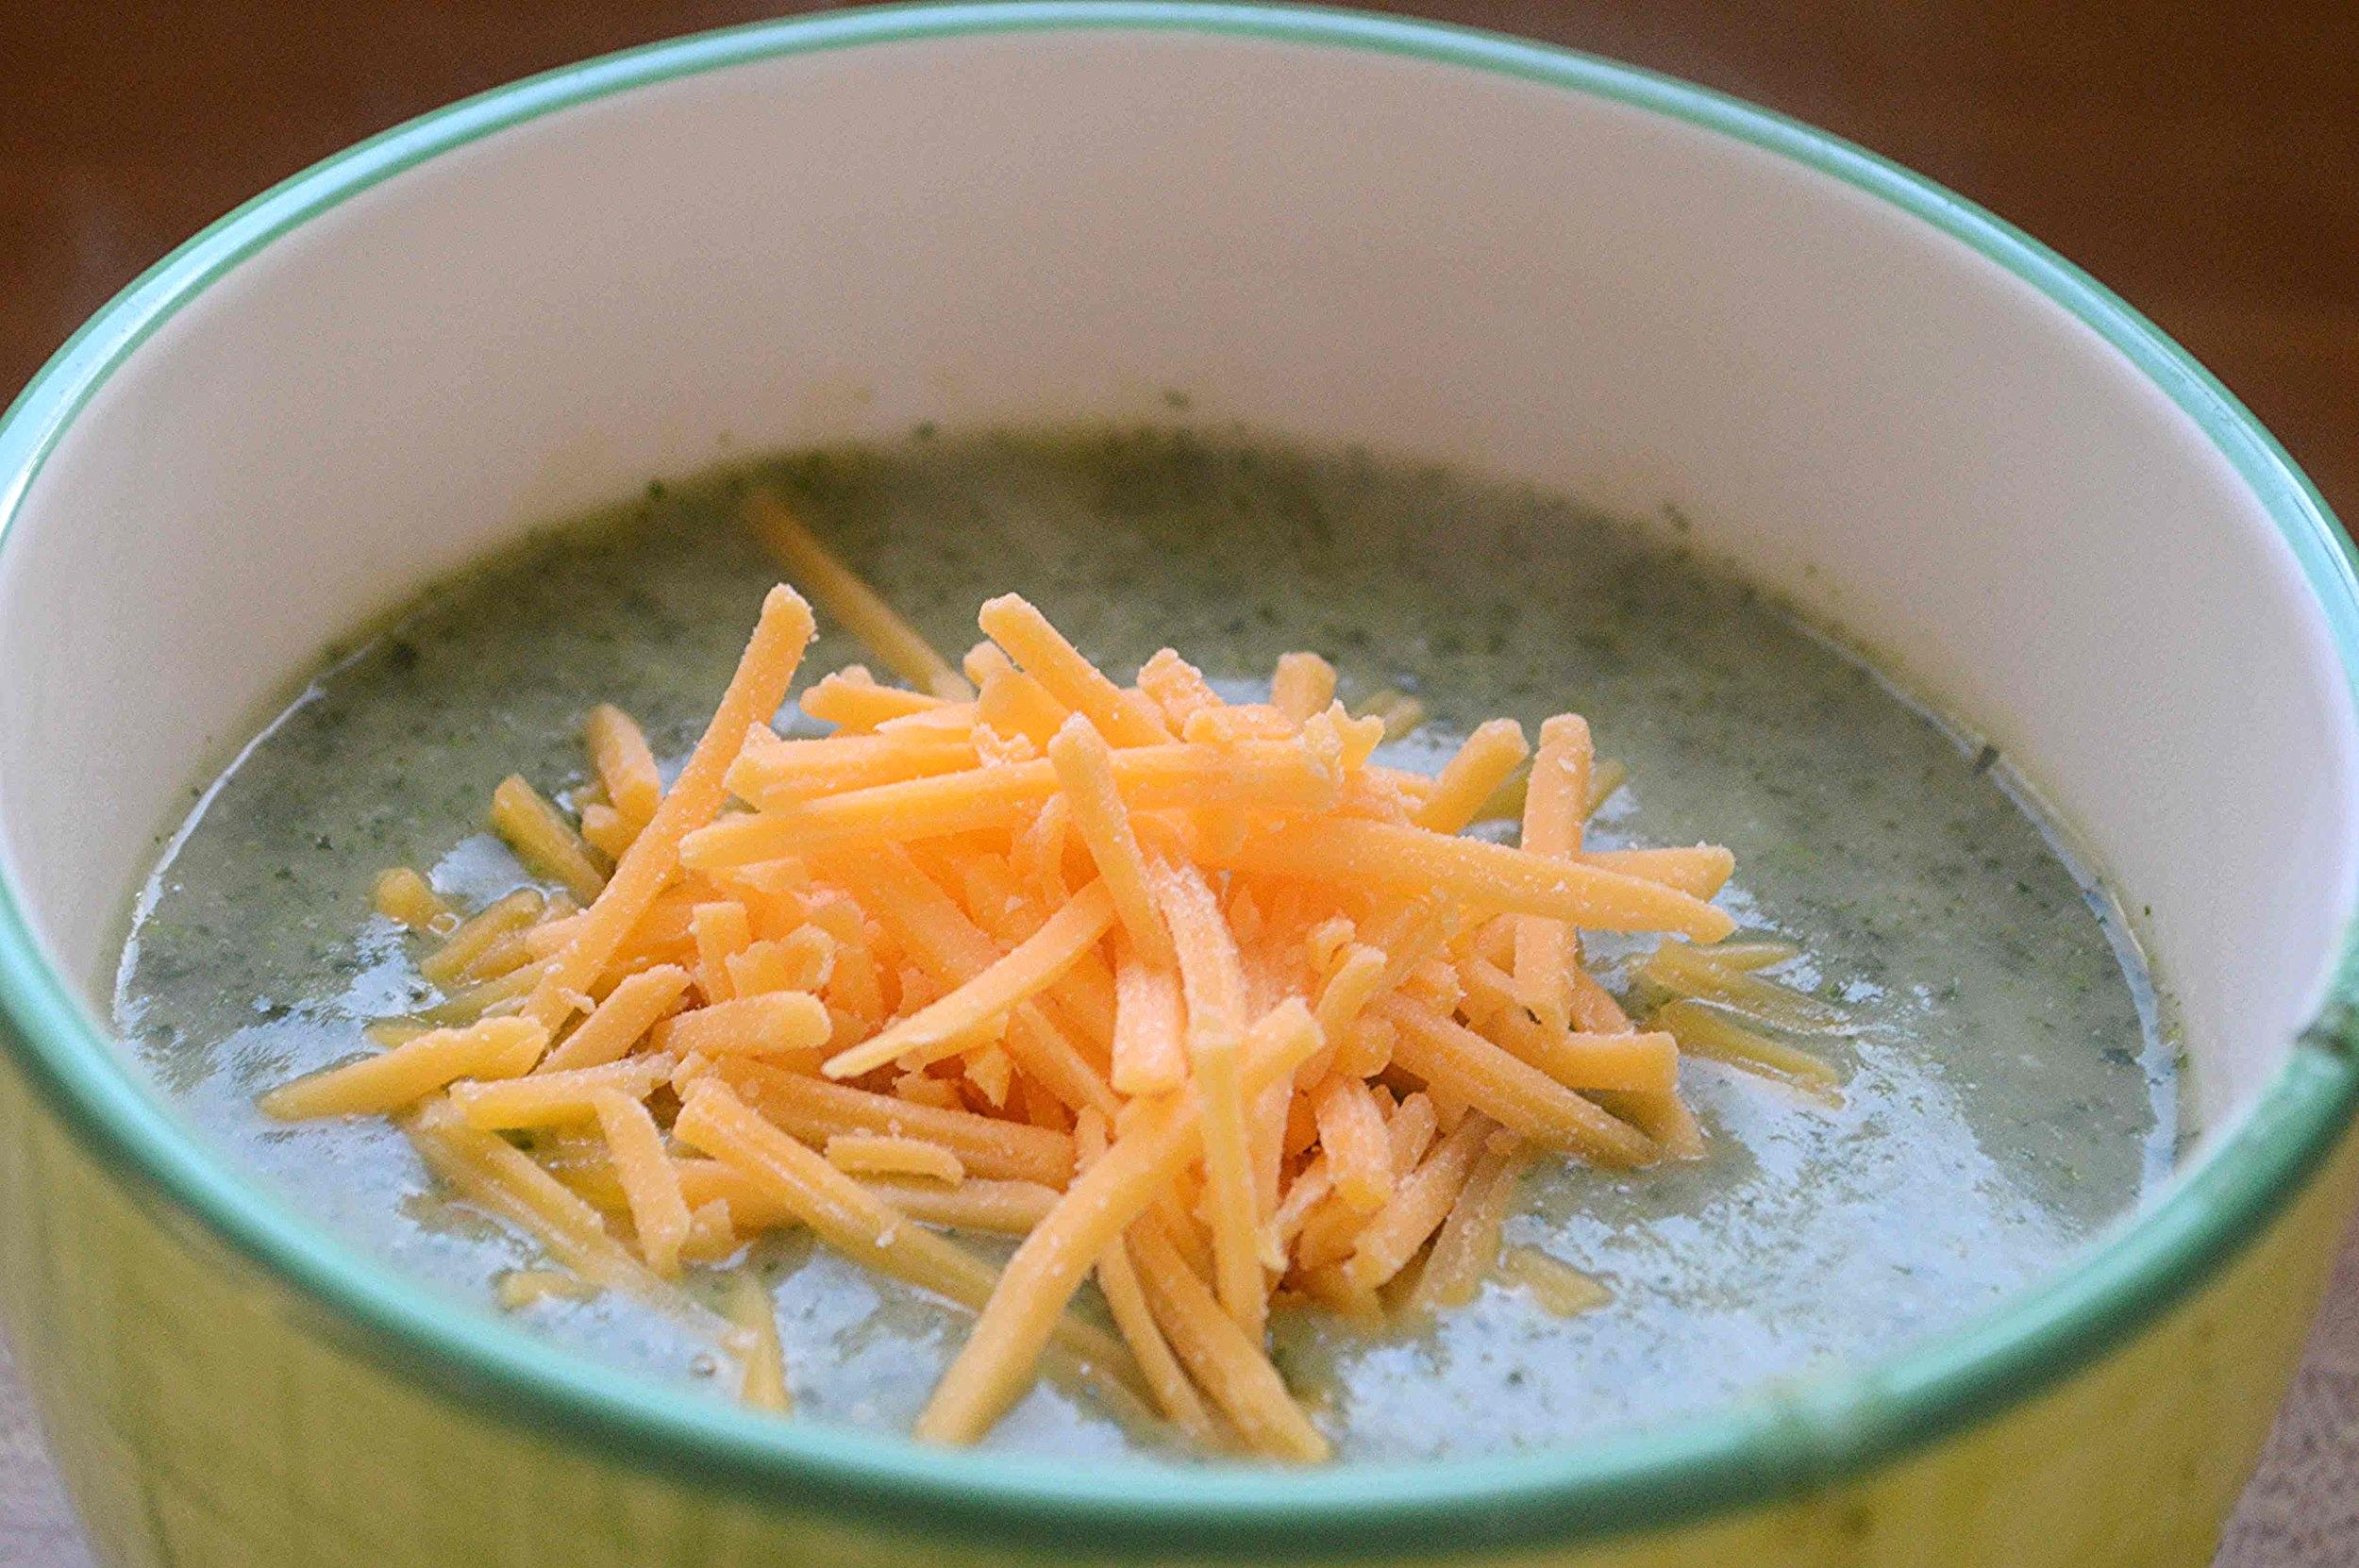 Broccoli Rabe Potato Soup with Cheddar